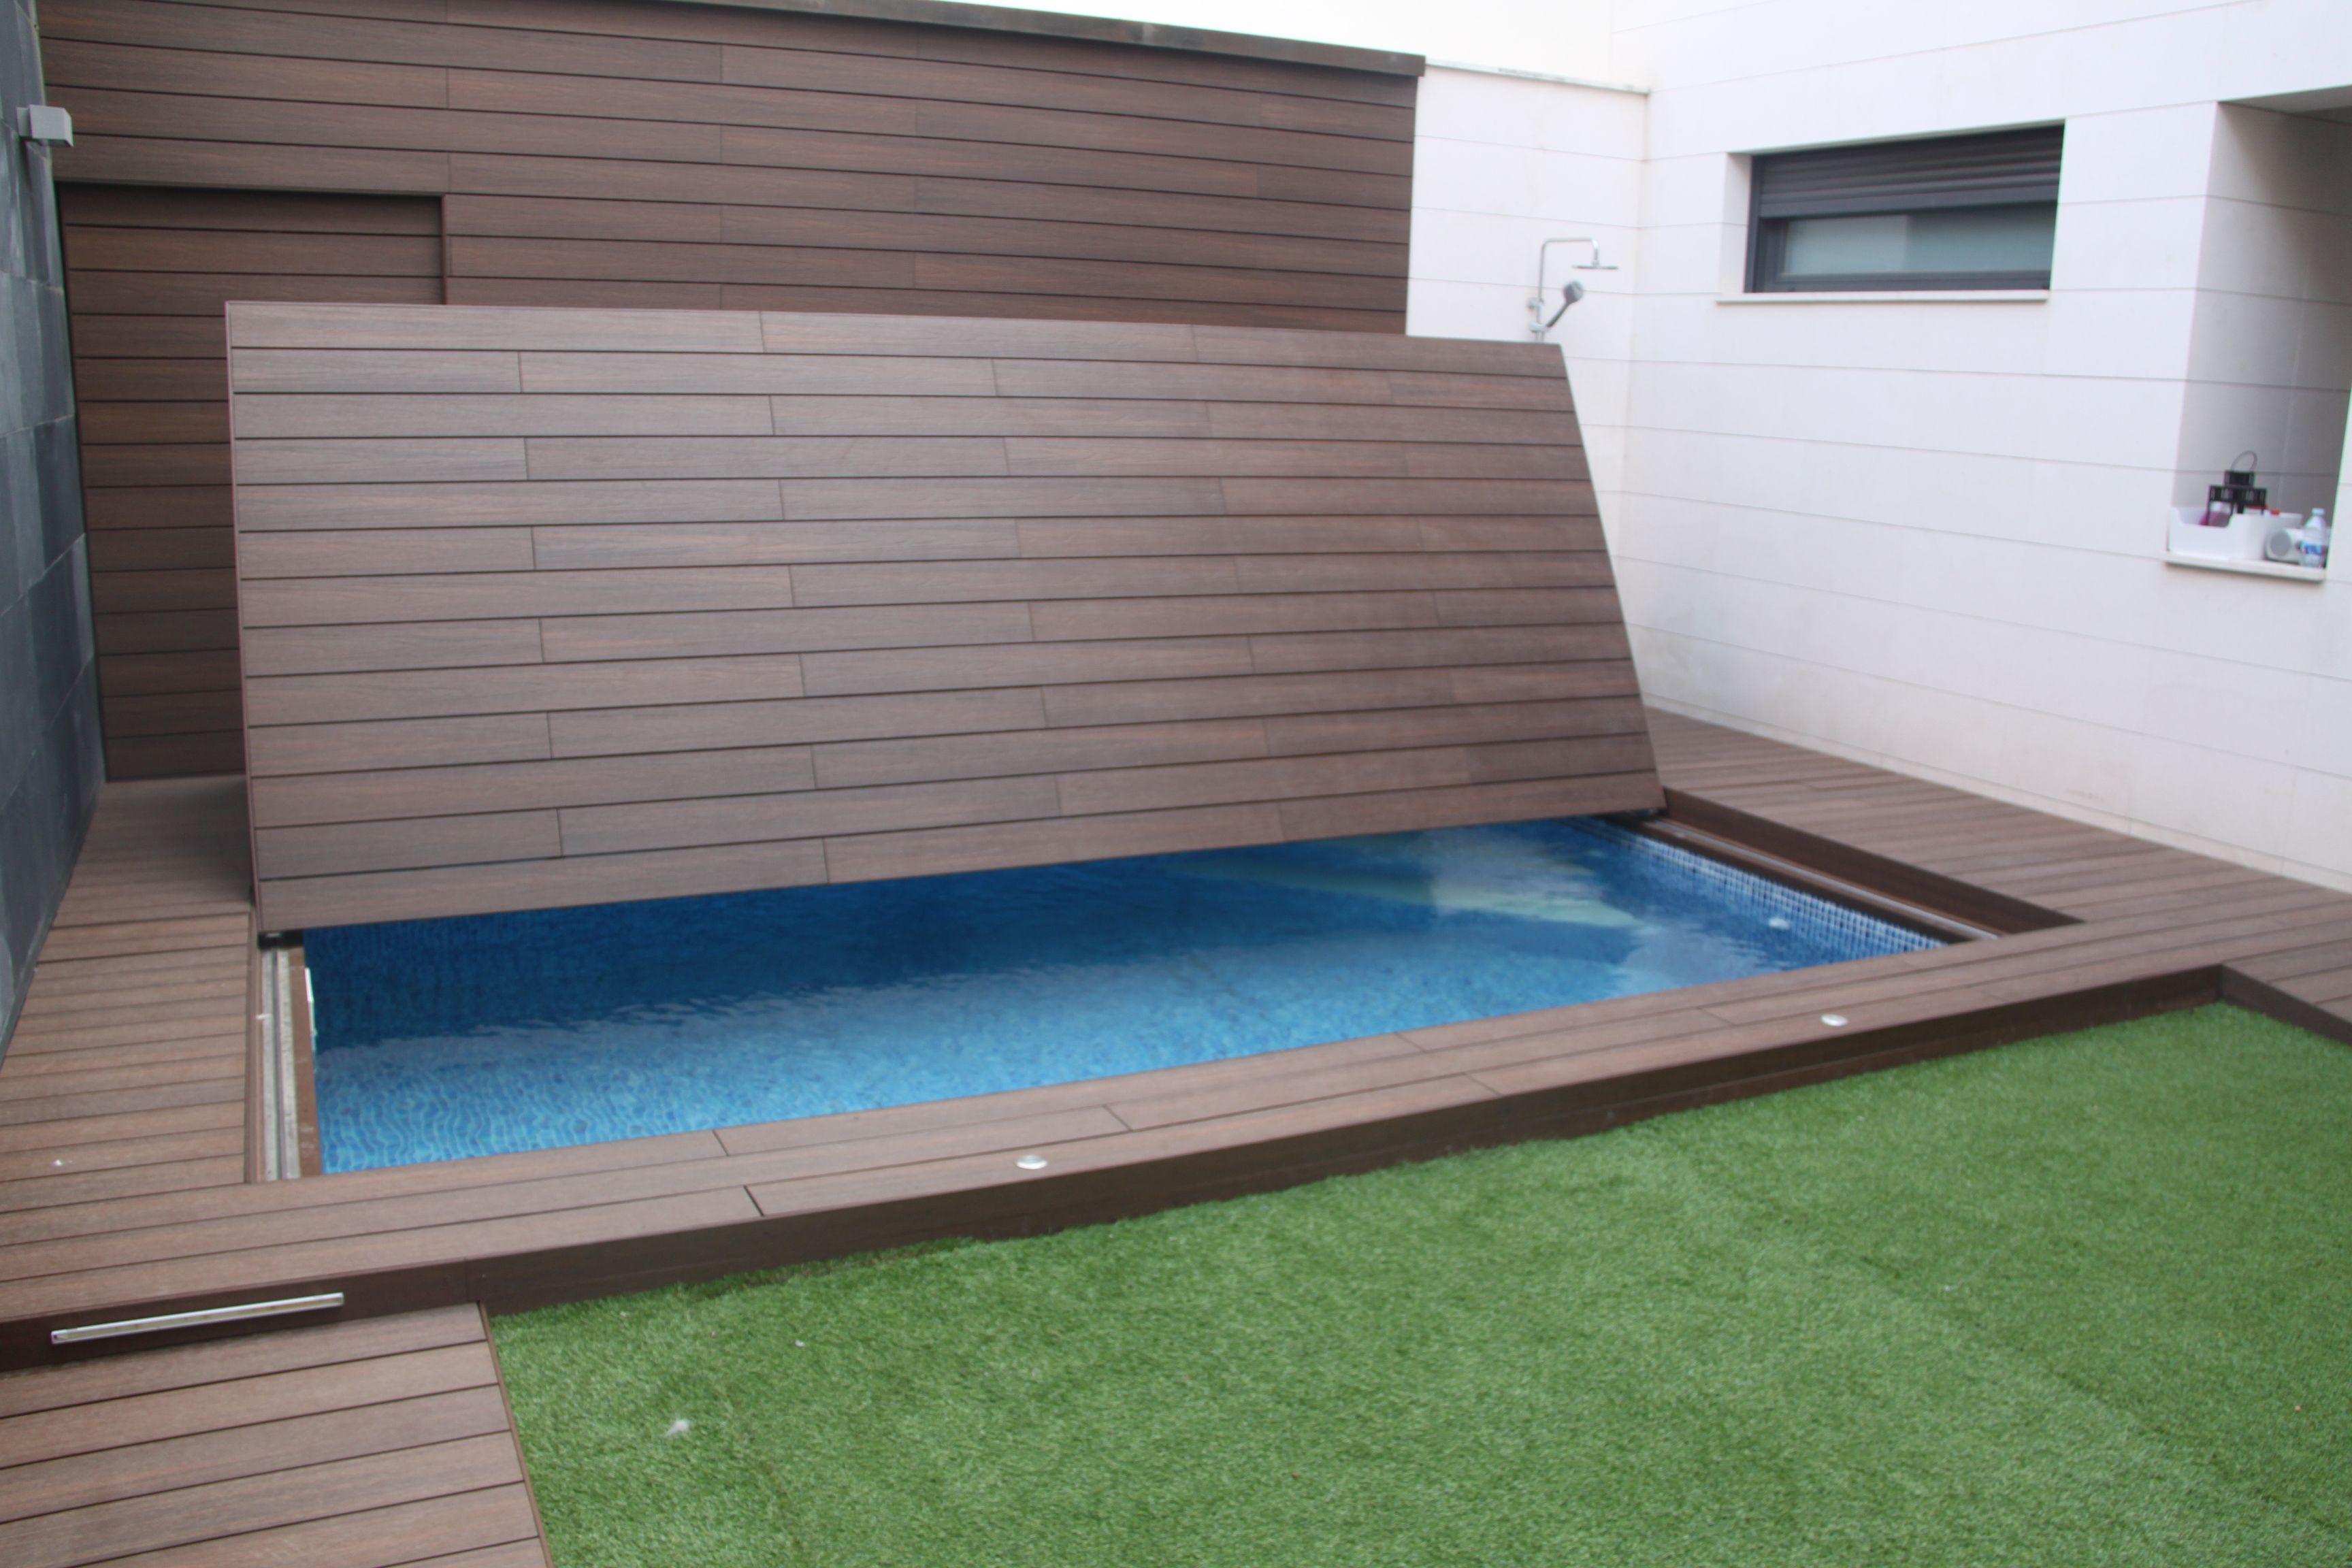 Piscina oculta apertura hacia la pared terminaci n en for Cubierta piscina transitable